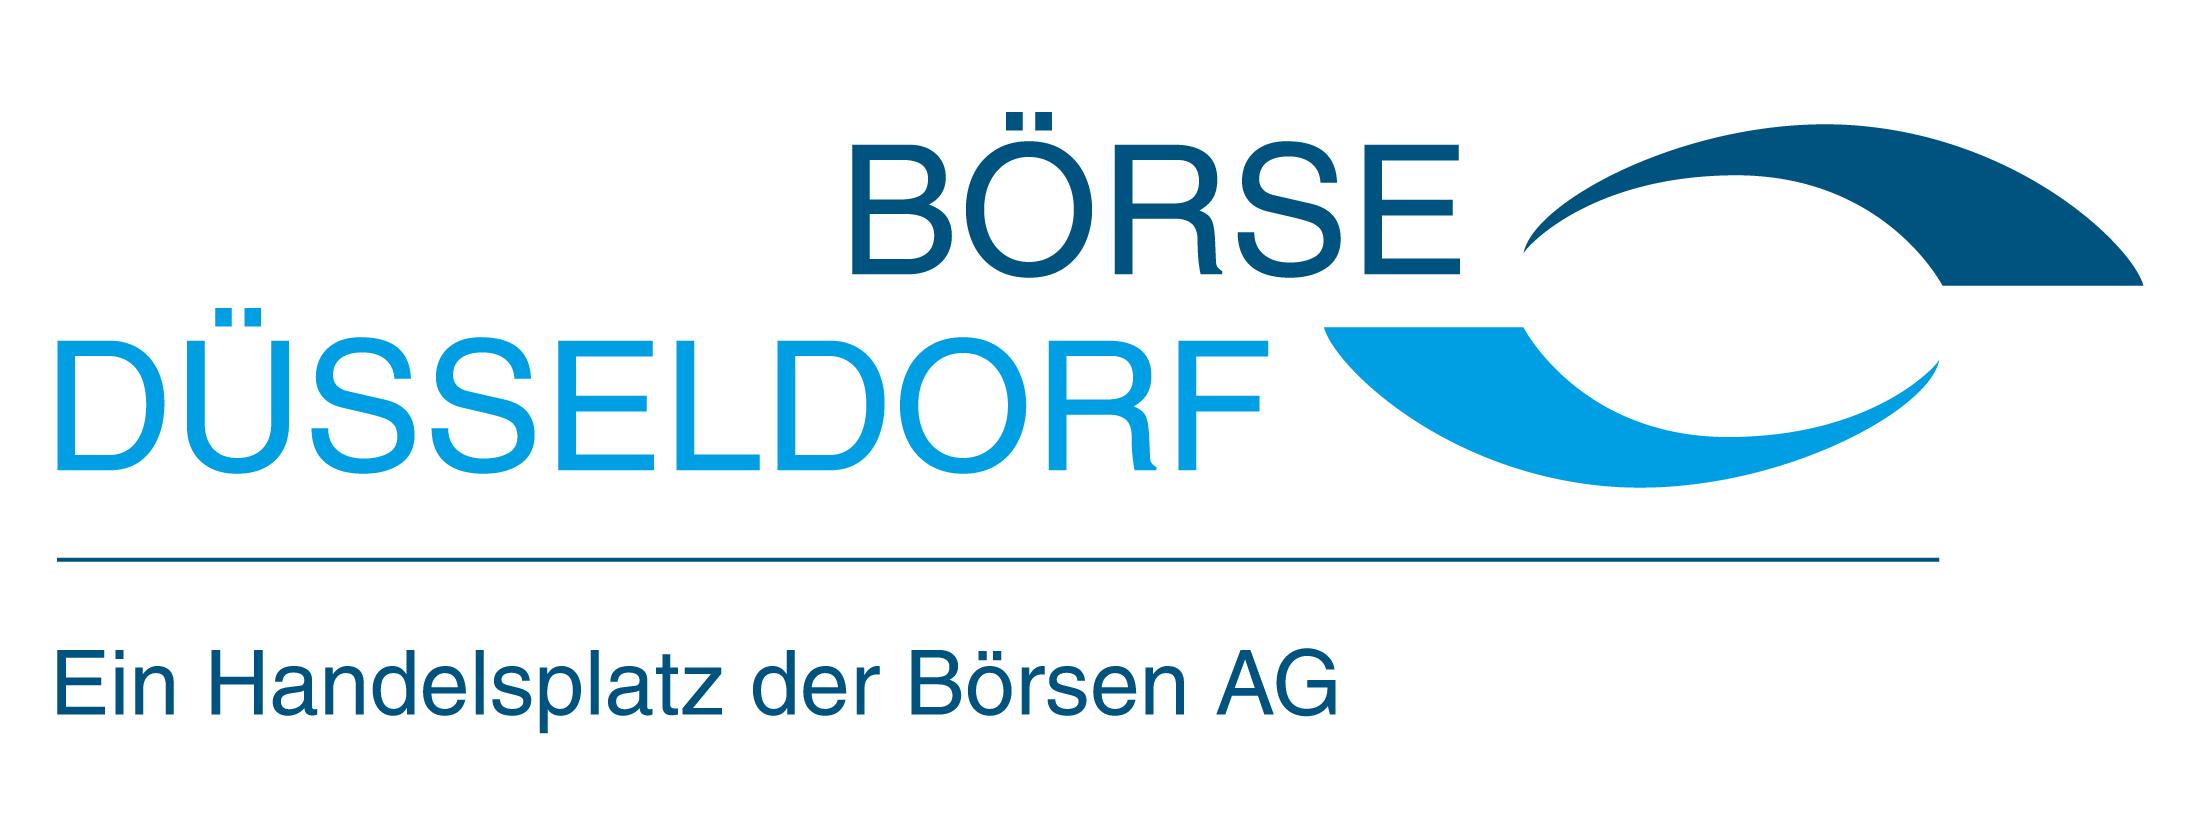 Logo der Börse Düsseldorf